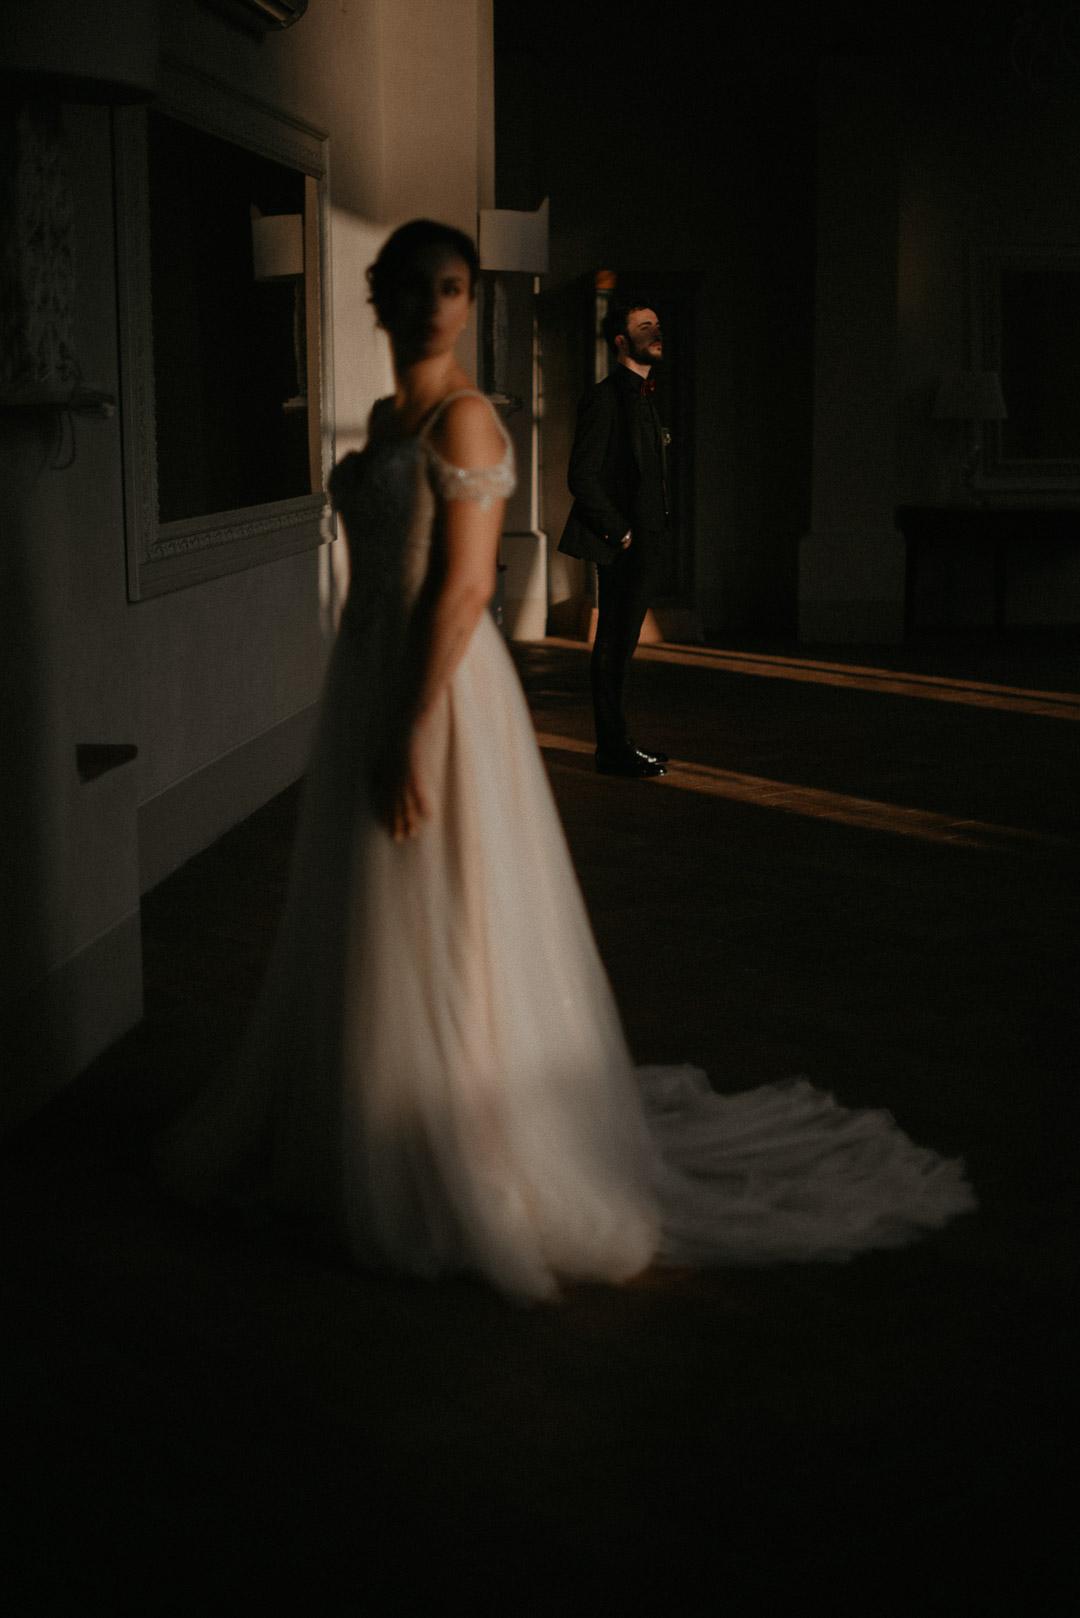 wedding-photographer-destination-fineart-bespoke-reportage-tuscany-villascorzi-vivianeizzo-spazio46-117